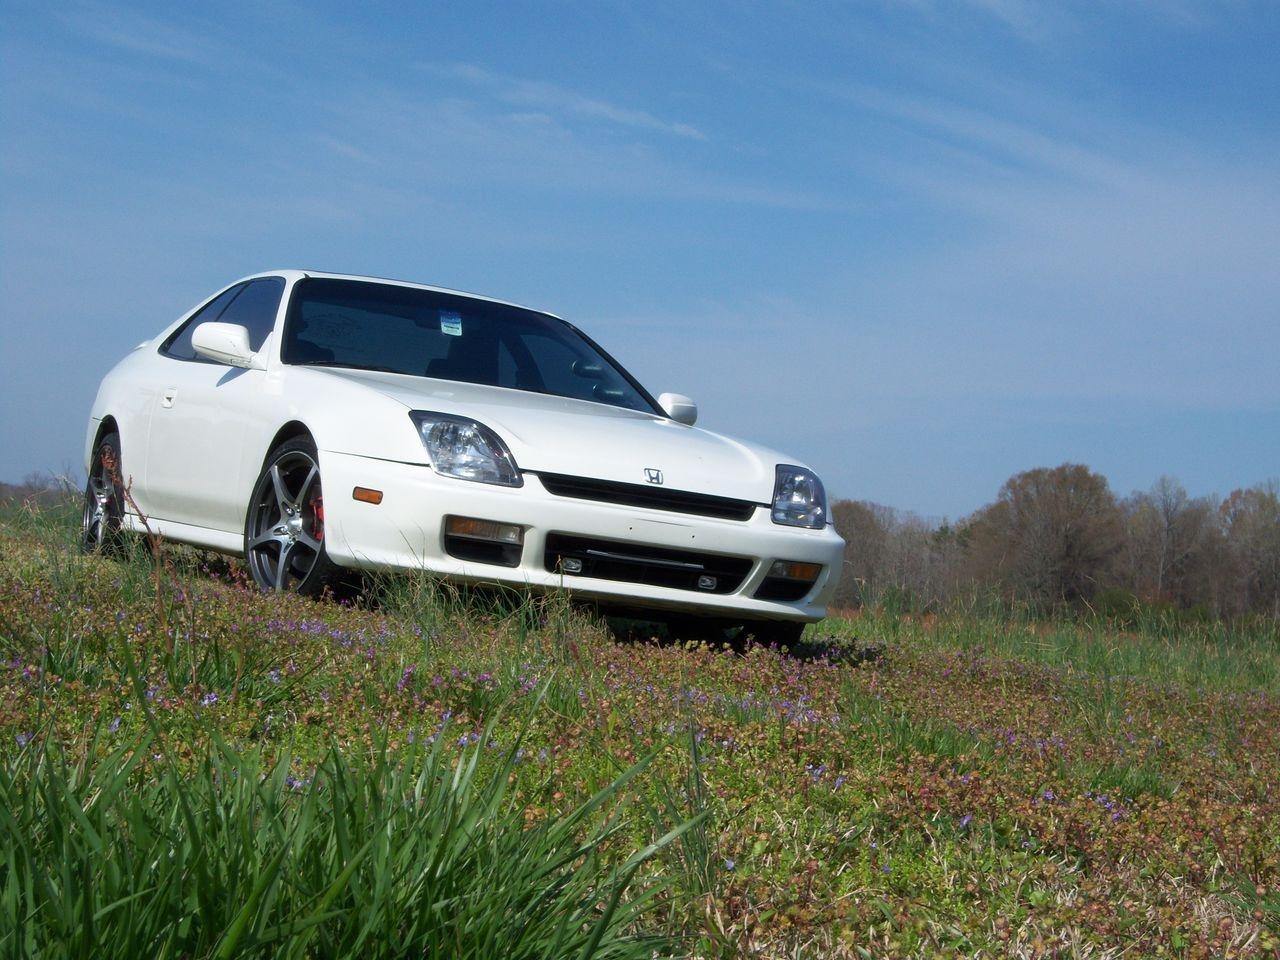 2001 Honda Prelude - Overview - CarGurus